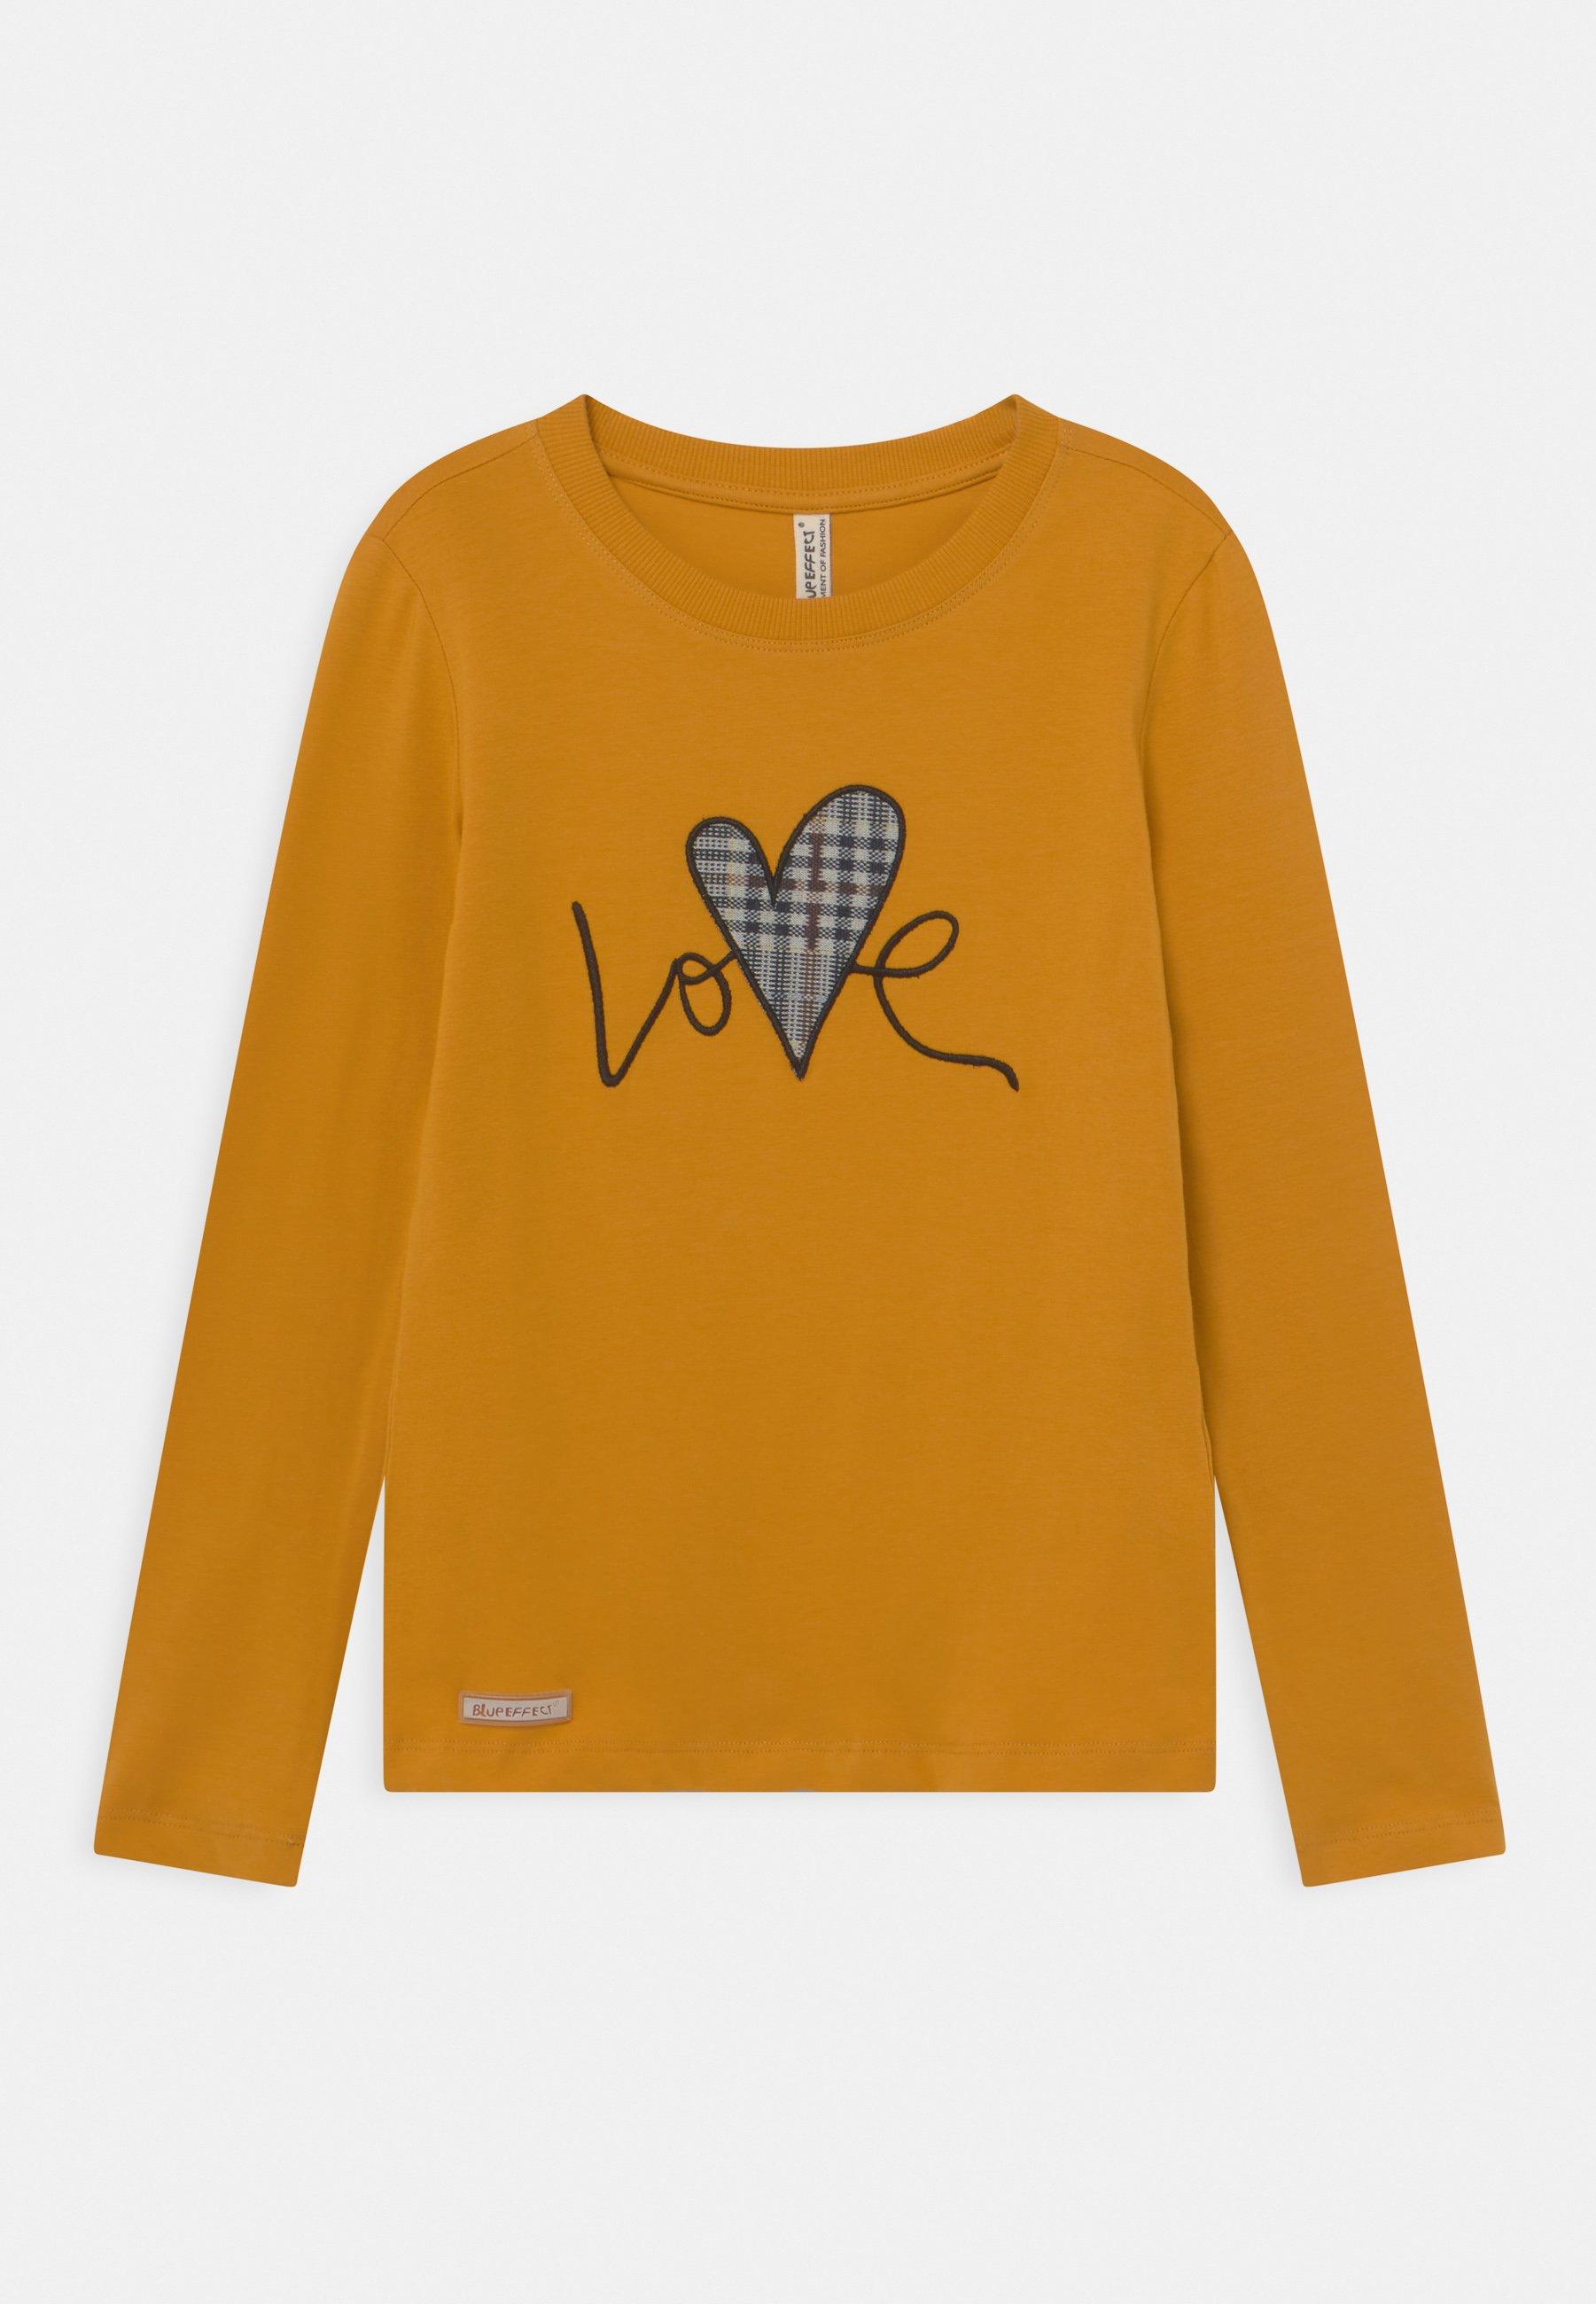 Enfant GIRLS LOVE LONGSLEEVE - T-shirt à manches longues